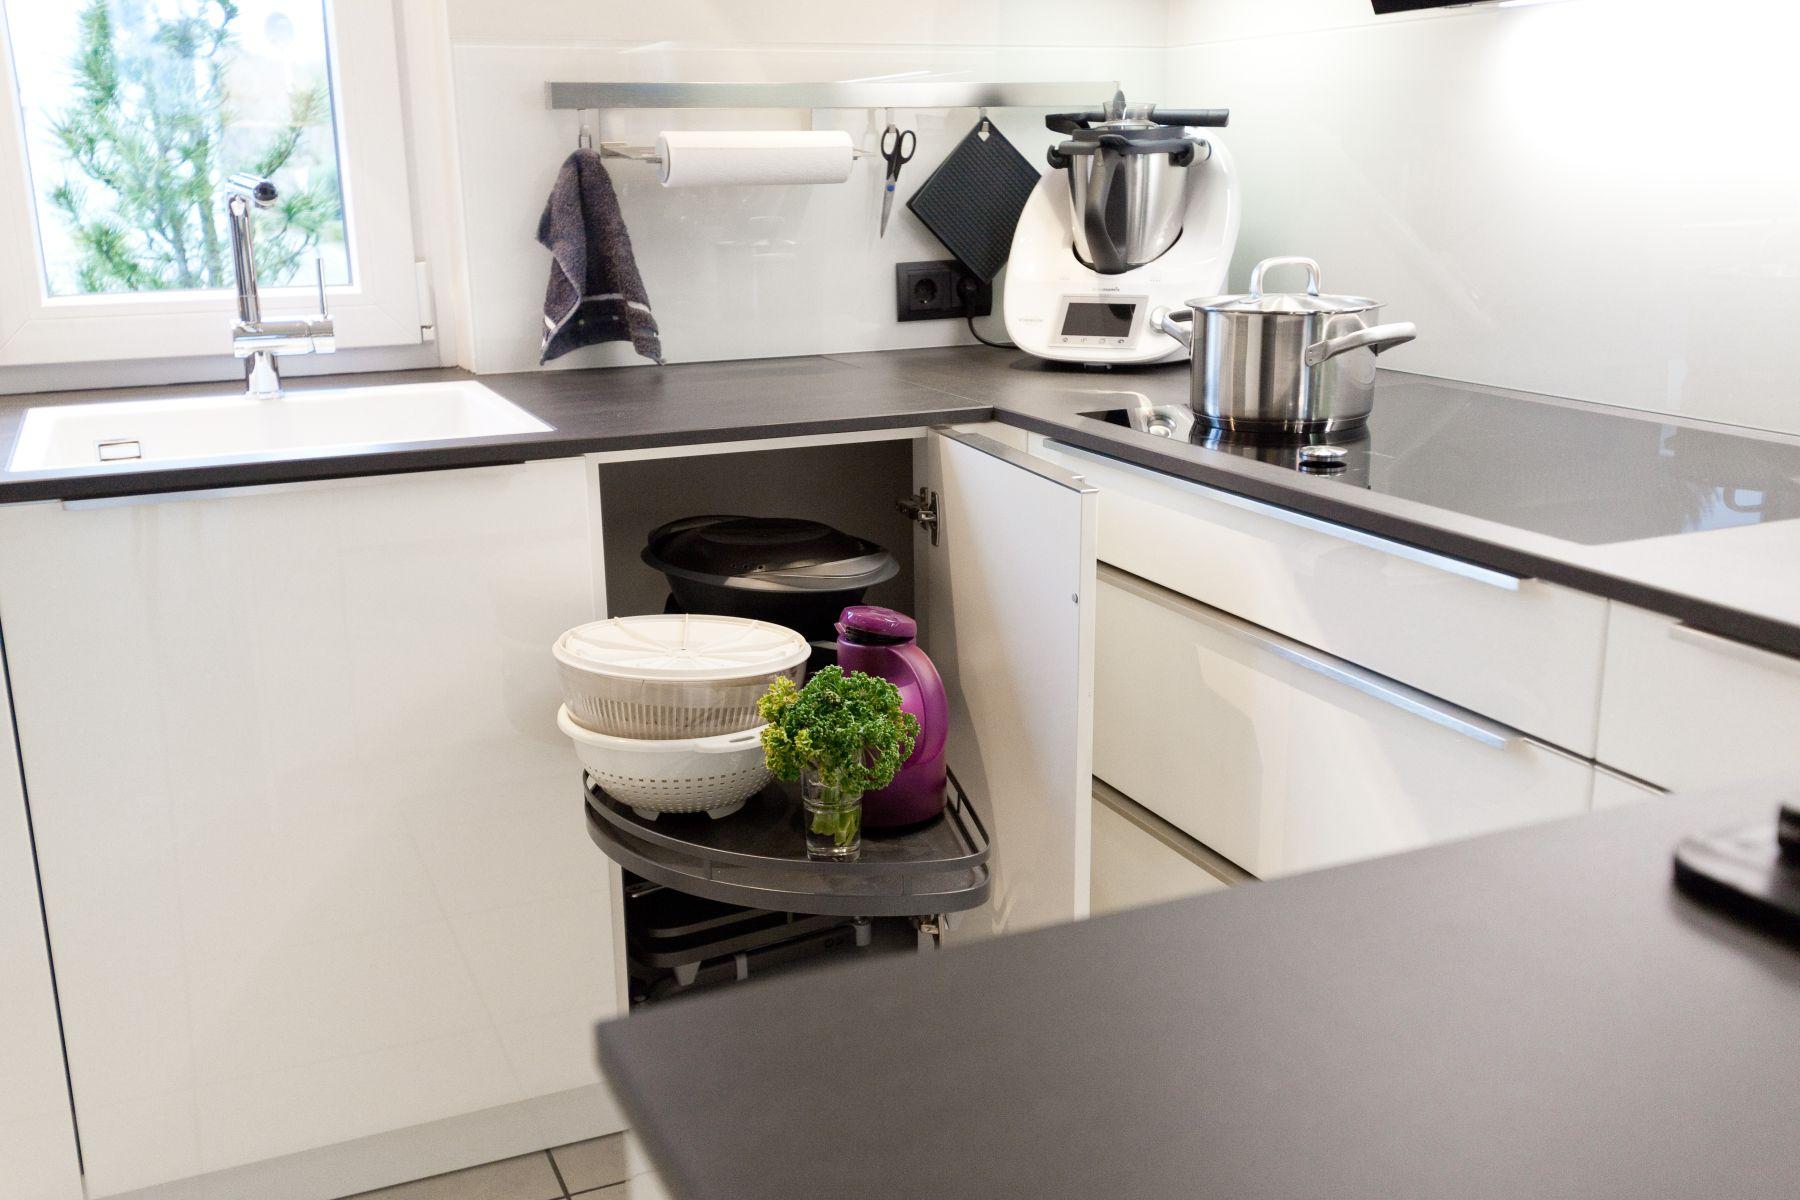 Küche Weiß Arbeitsplatte Holz | ocaccept.com